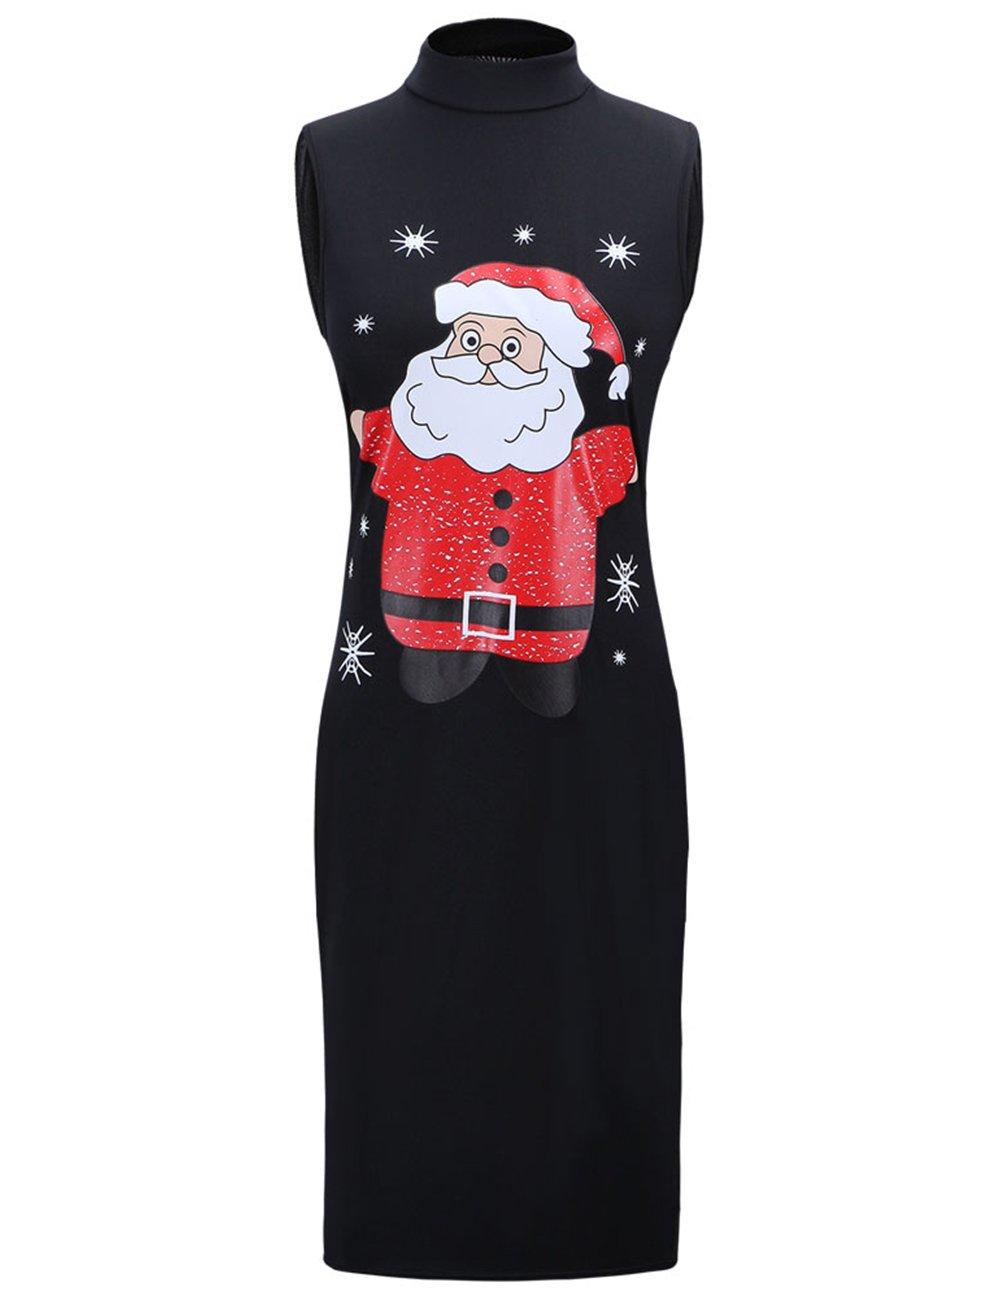 Ruiyige Girls Long Sleeve Mery Christmas Printed Loose Fit Mini Dress,#G102 Black 110cm fits 5-6 Years Old…